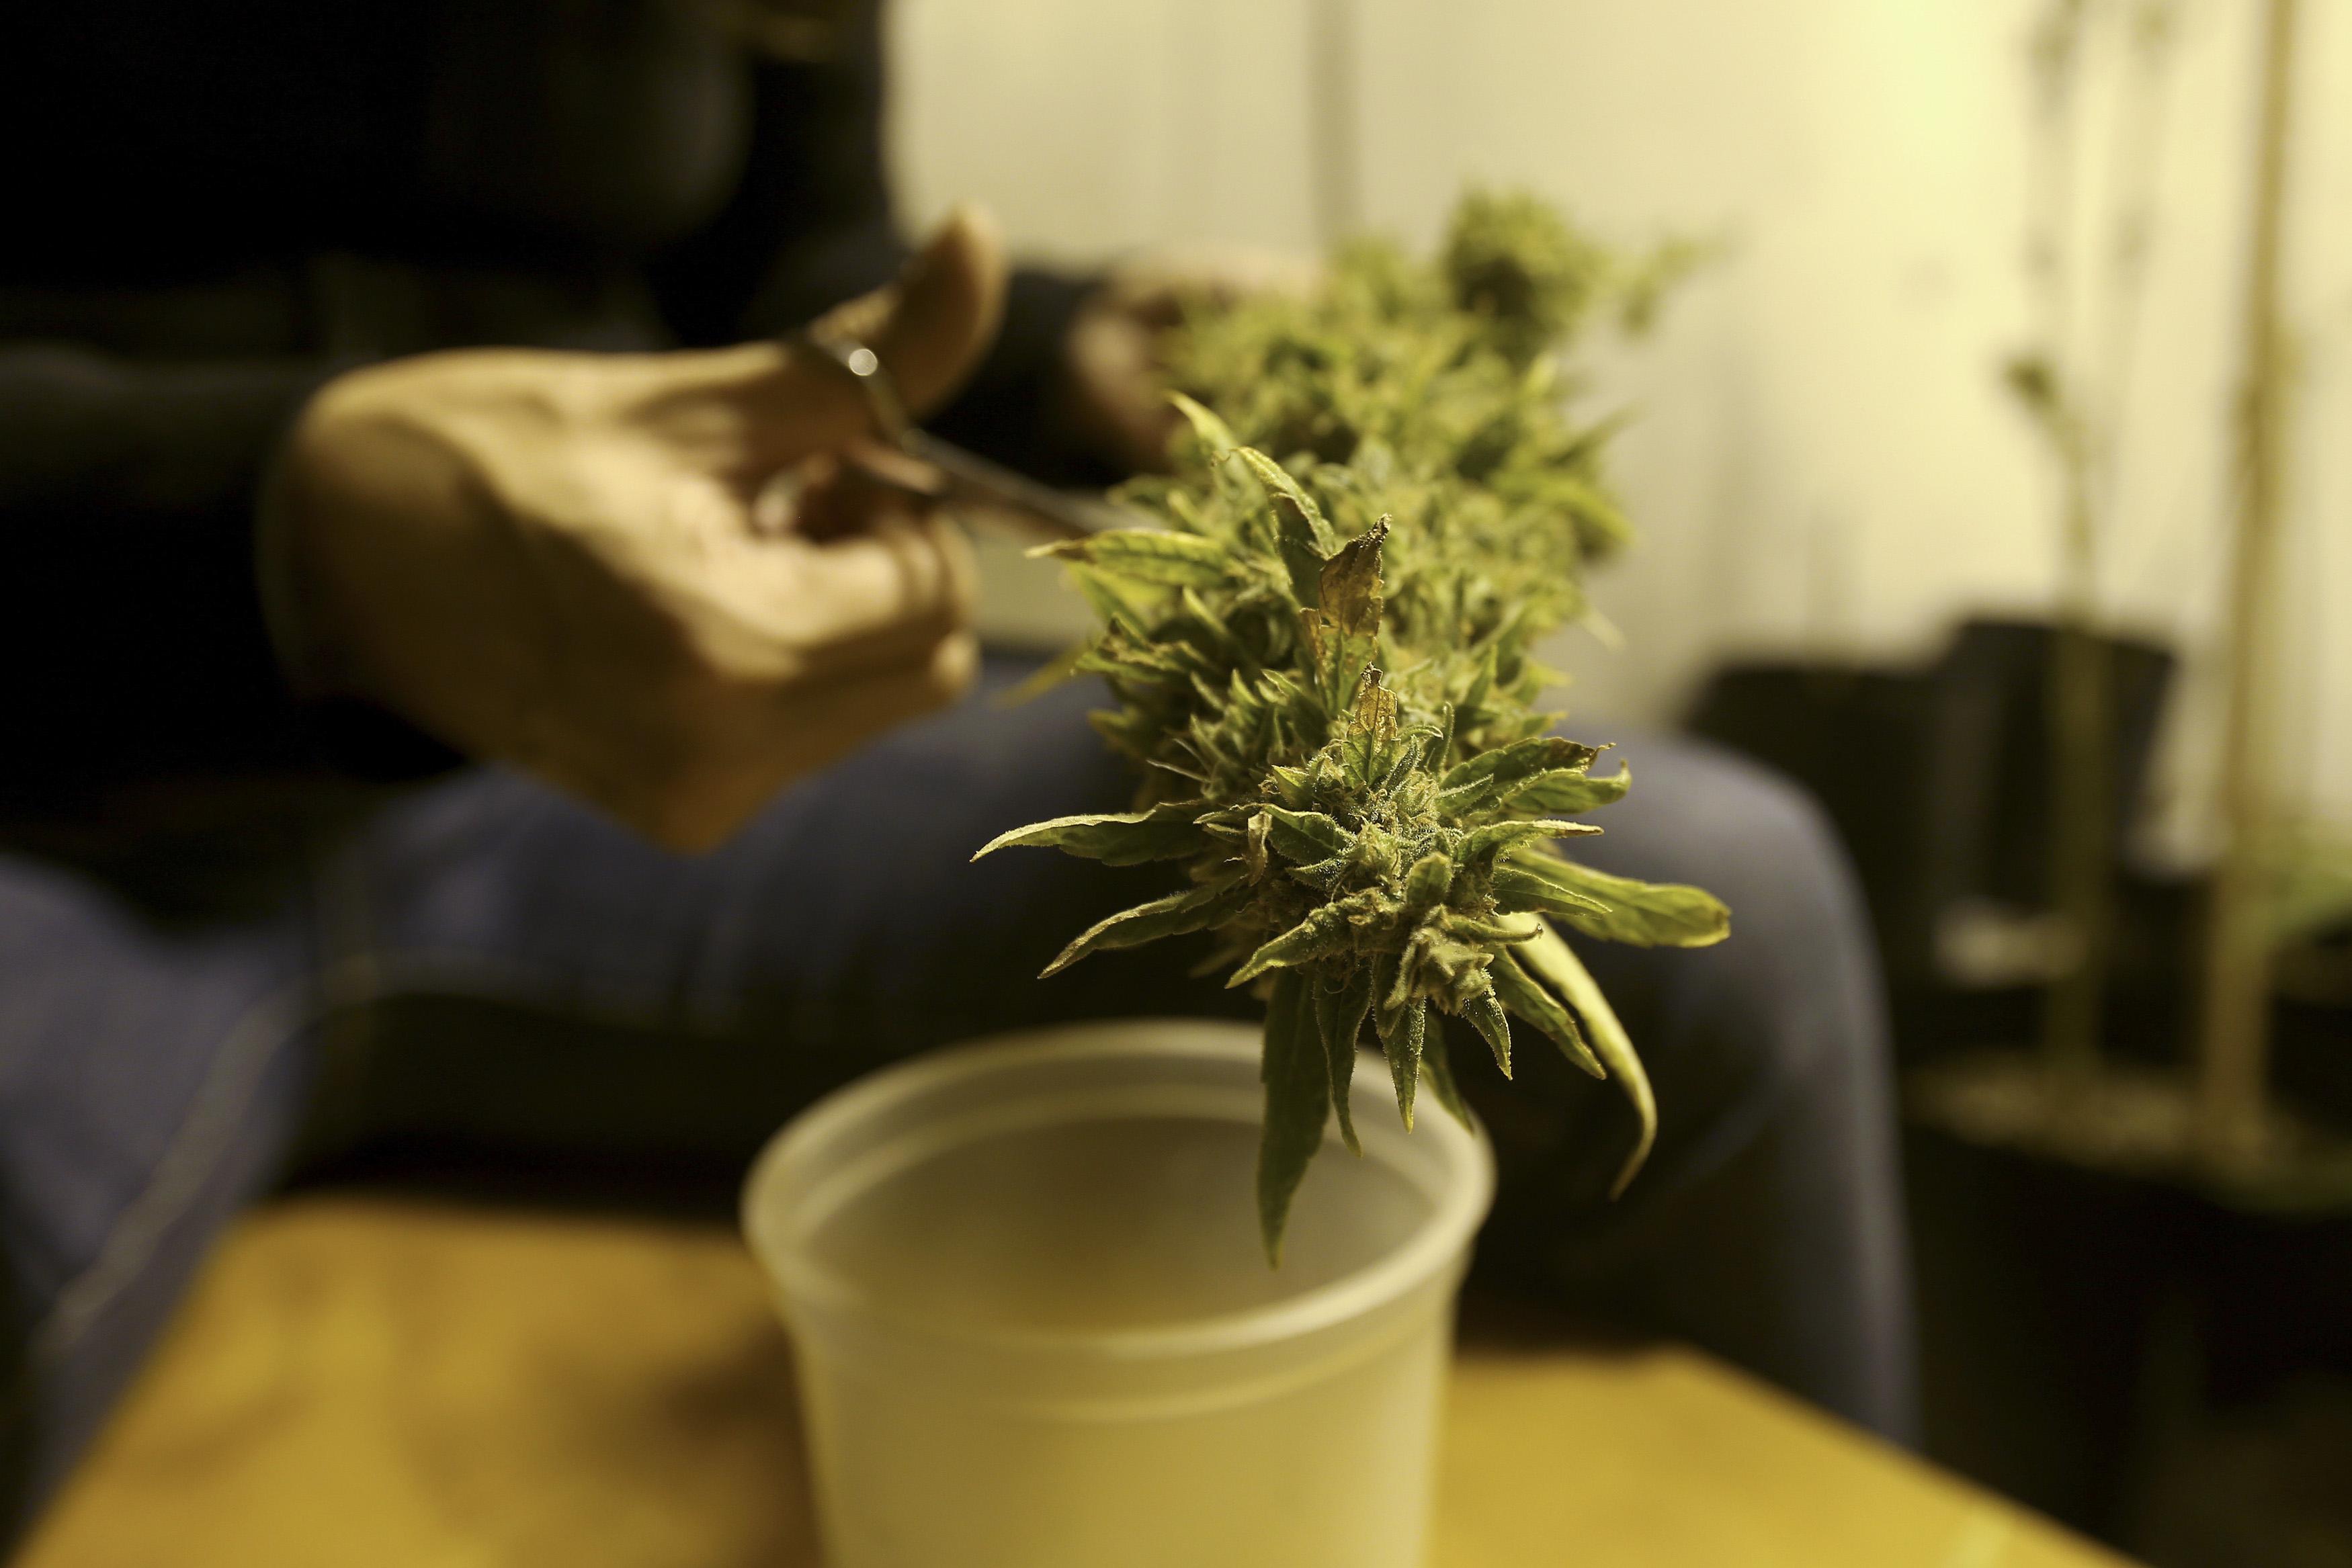 Uruguay to Sell Marijuana Tax-Free to Undercut Drug Traffickers